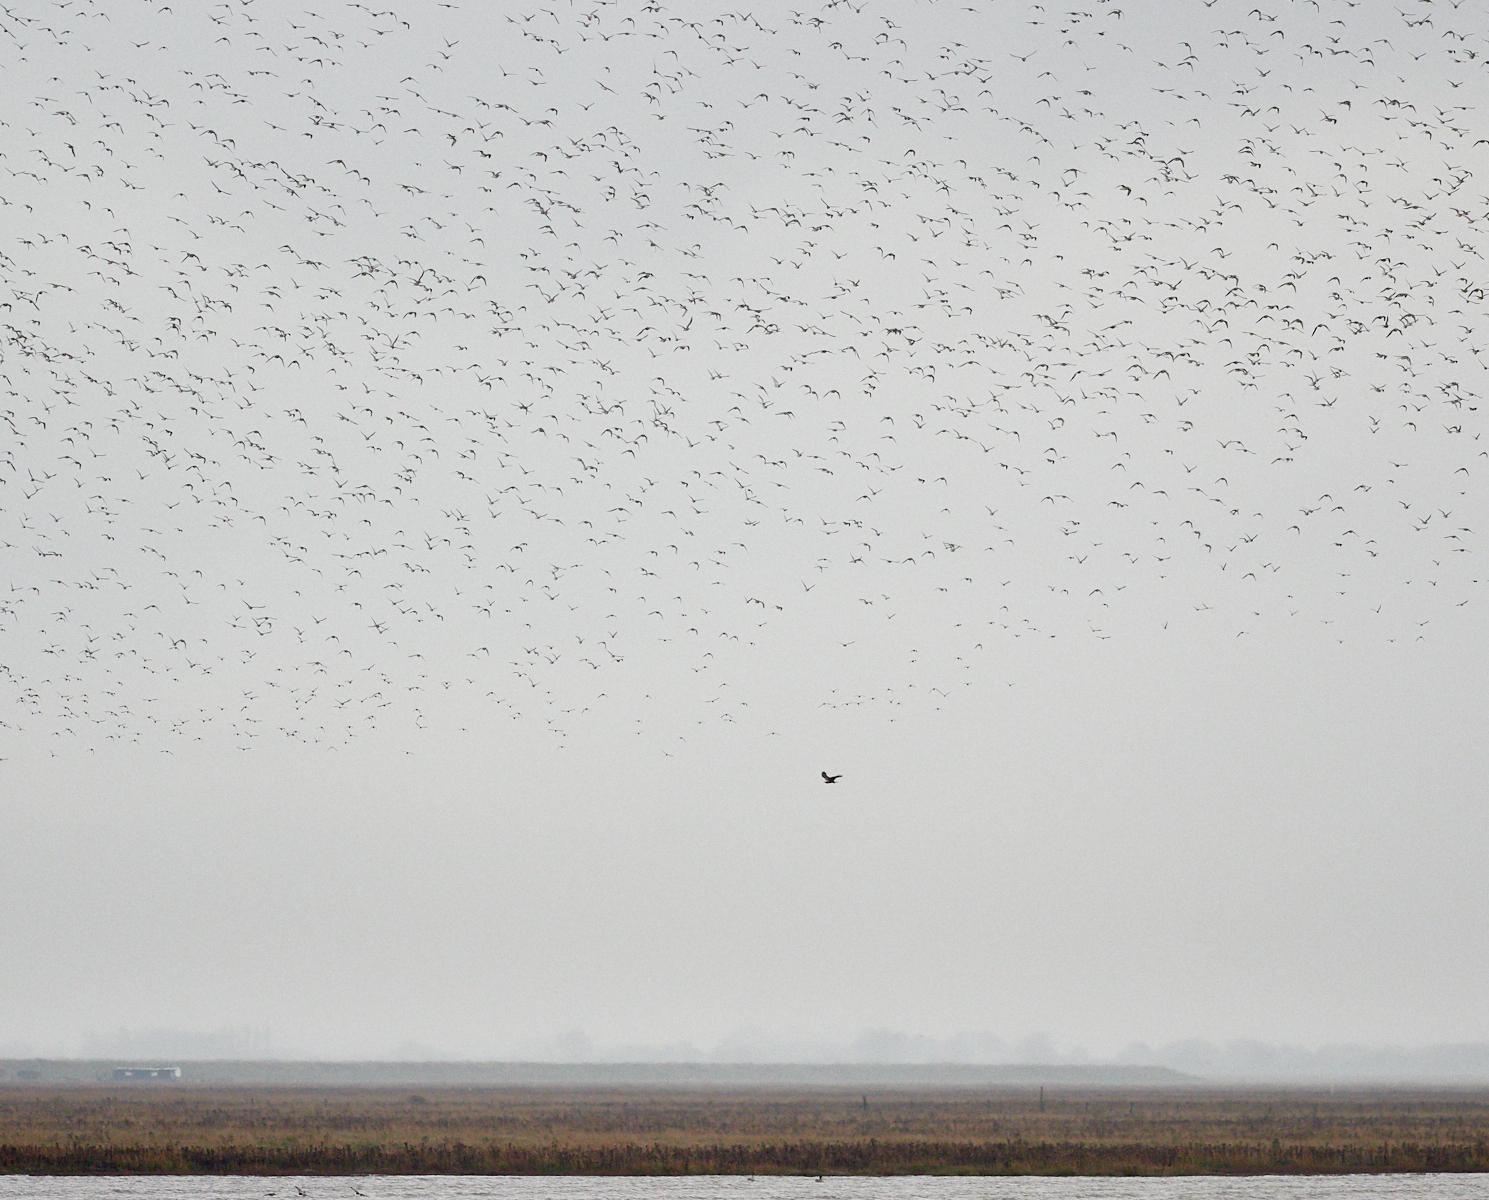 Murmuration and marsh harrier1600x1200 sRGB.jpg